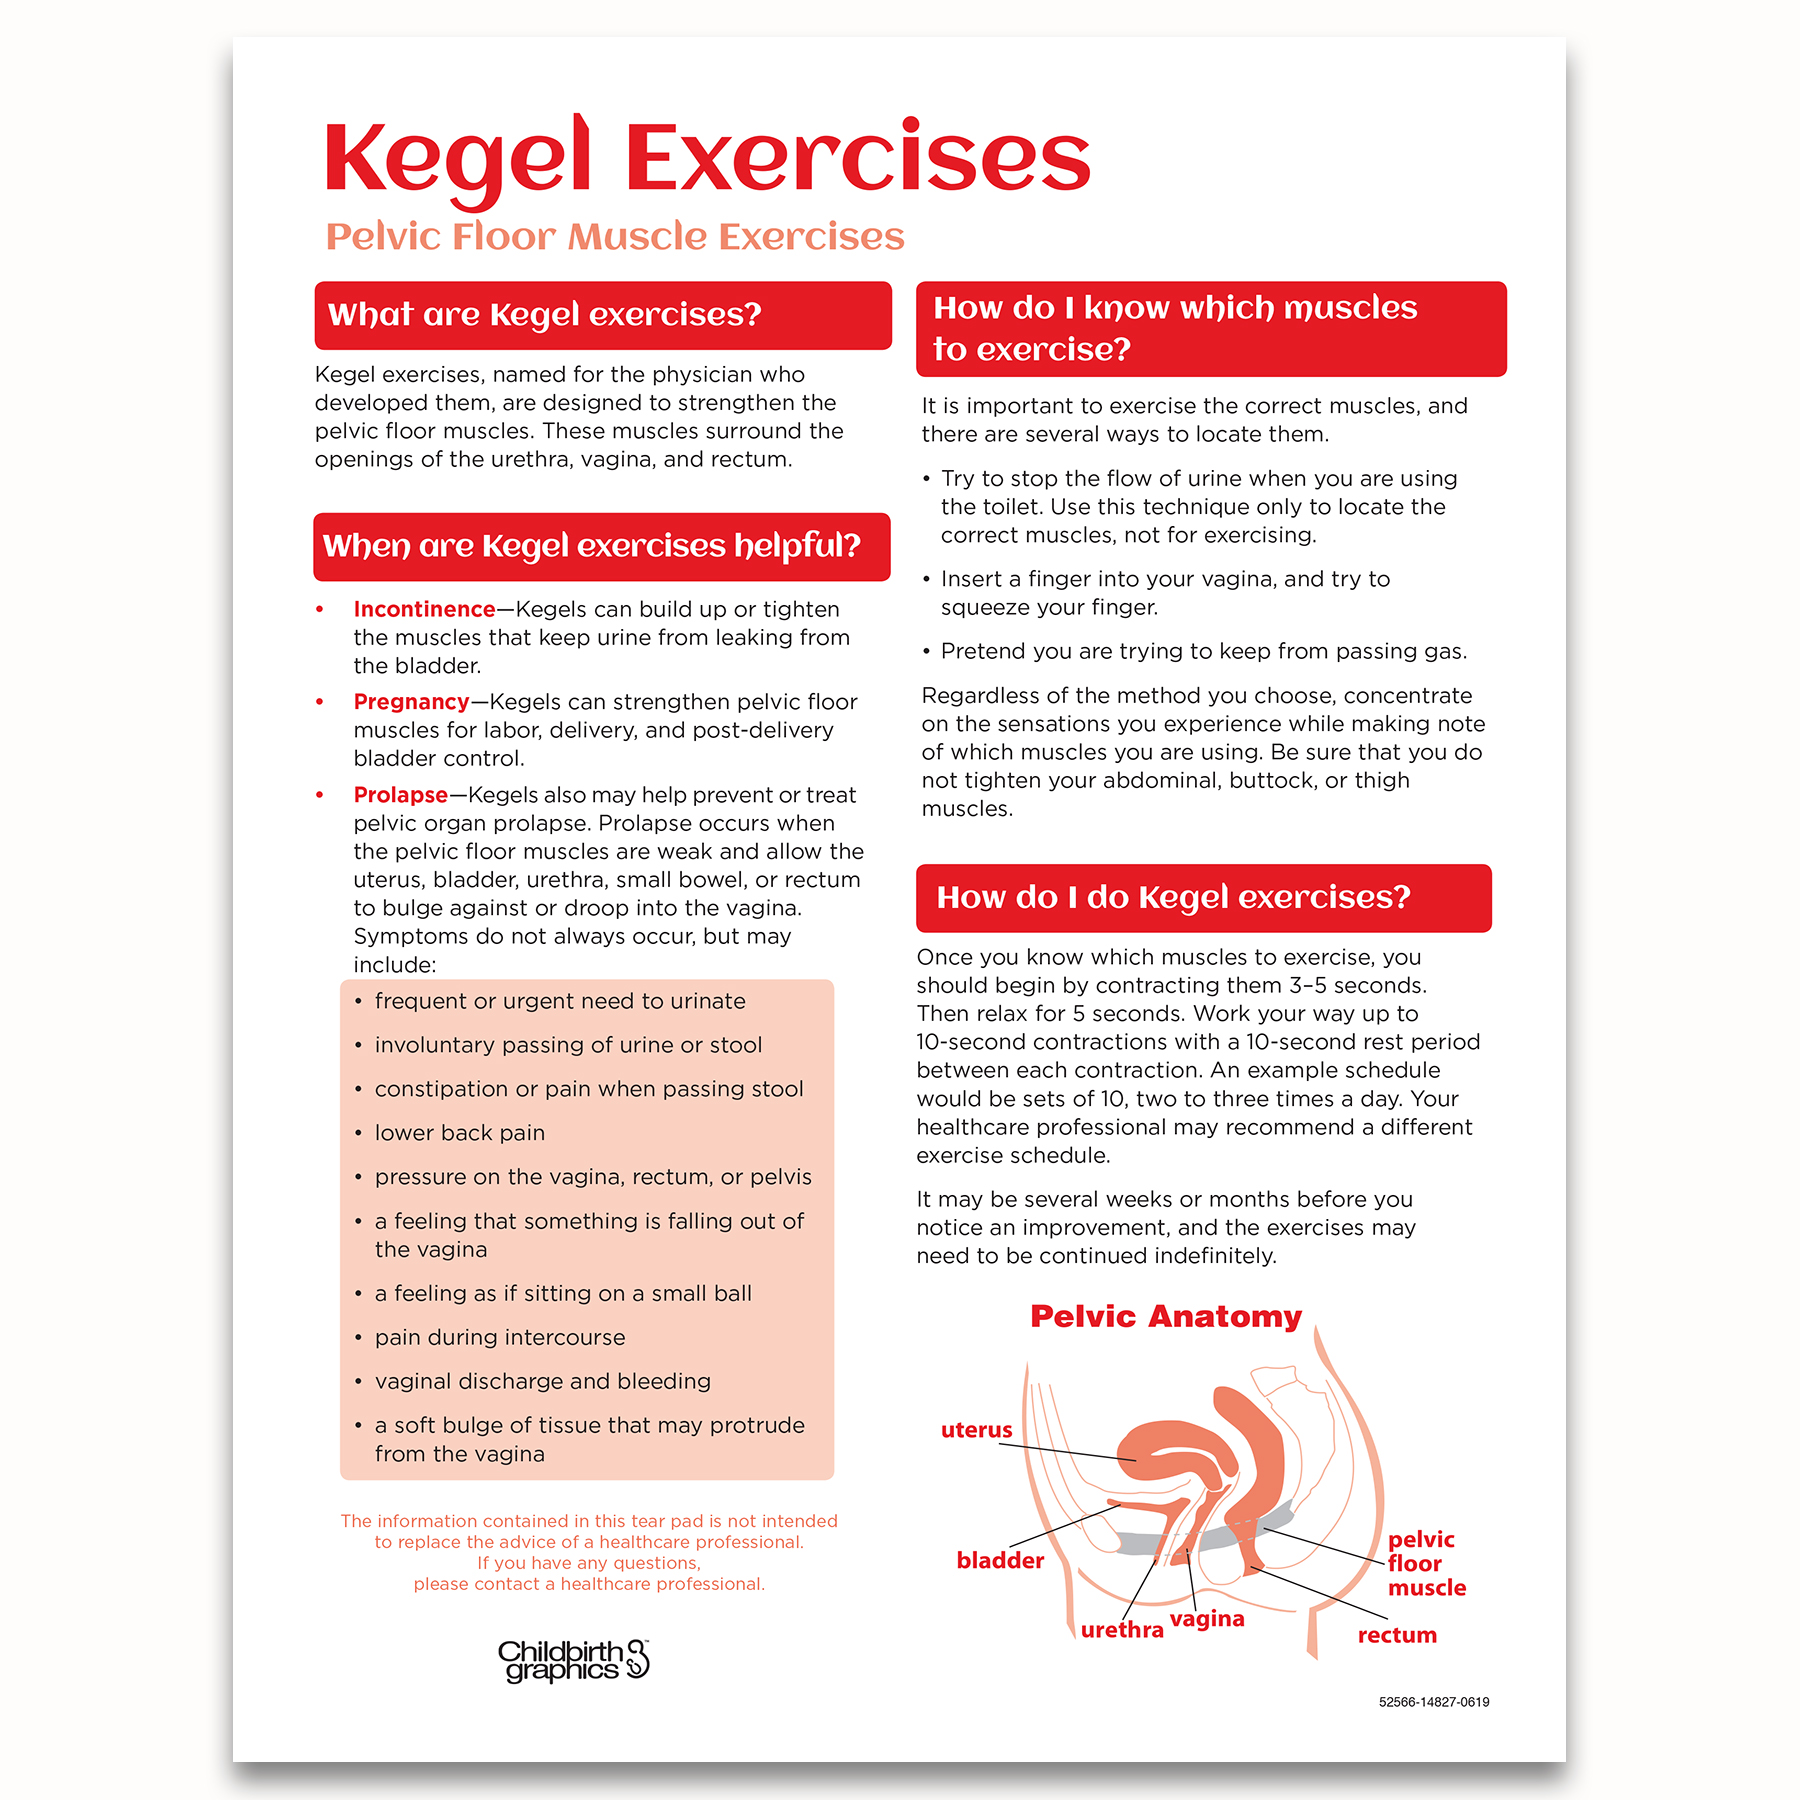 Kegel Exercises Educational Tear Pad Childbirth Graphics